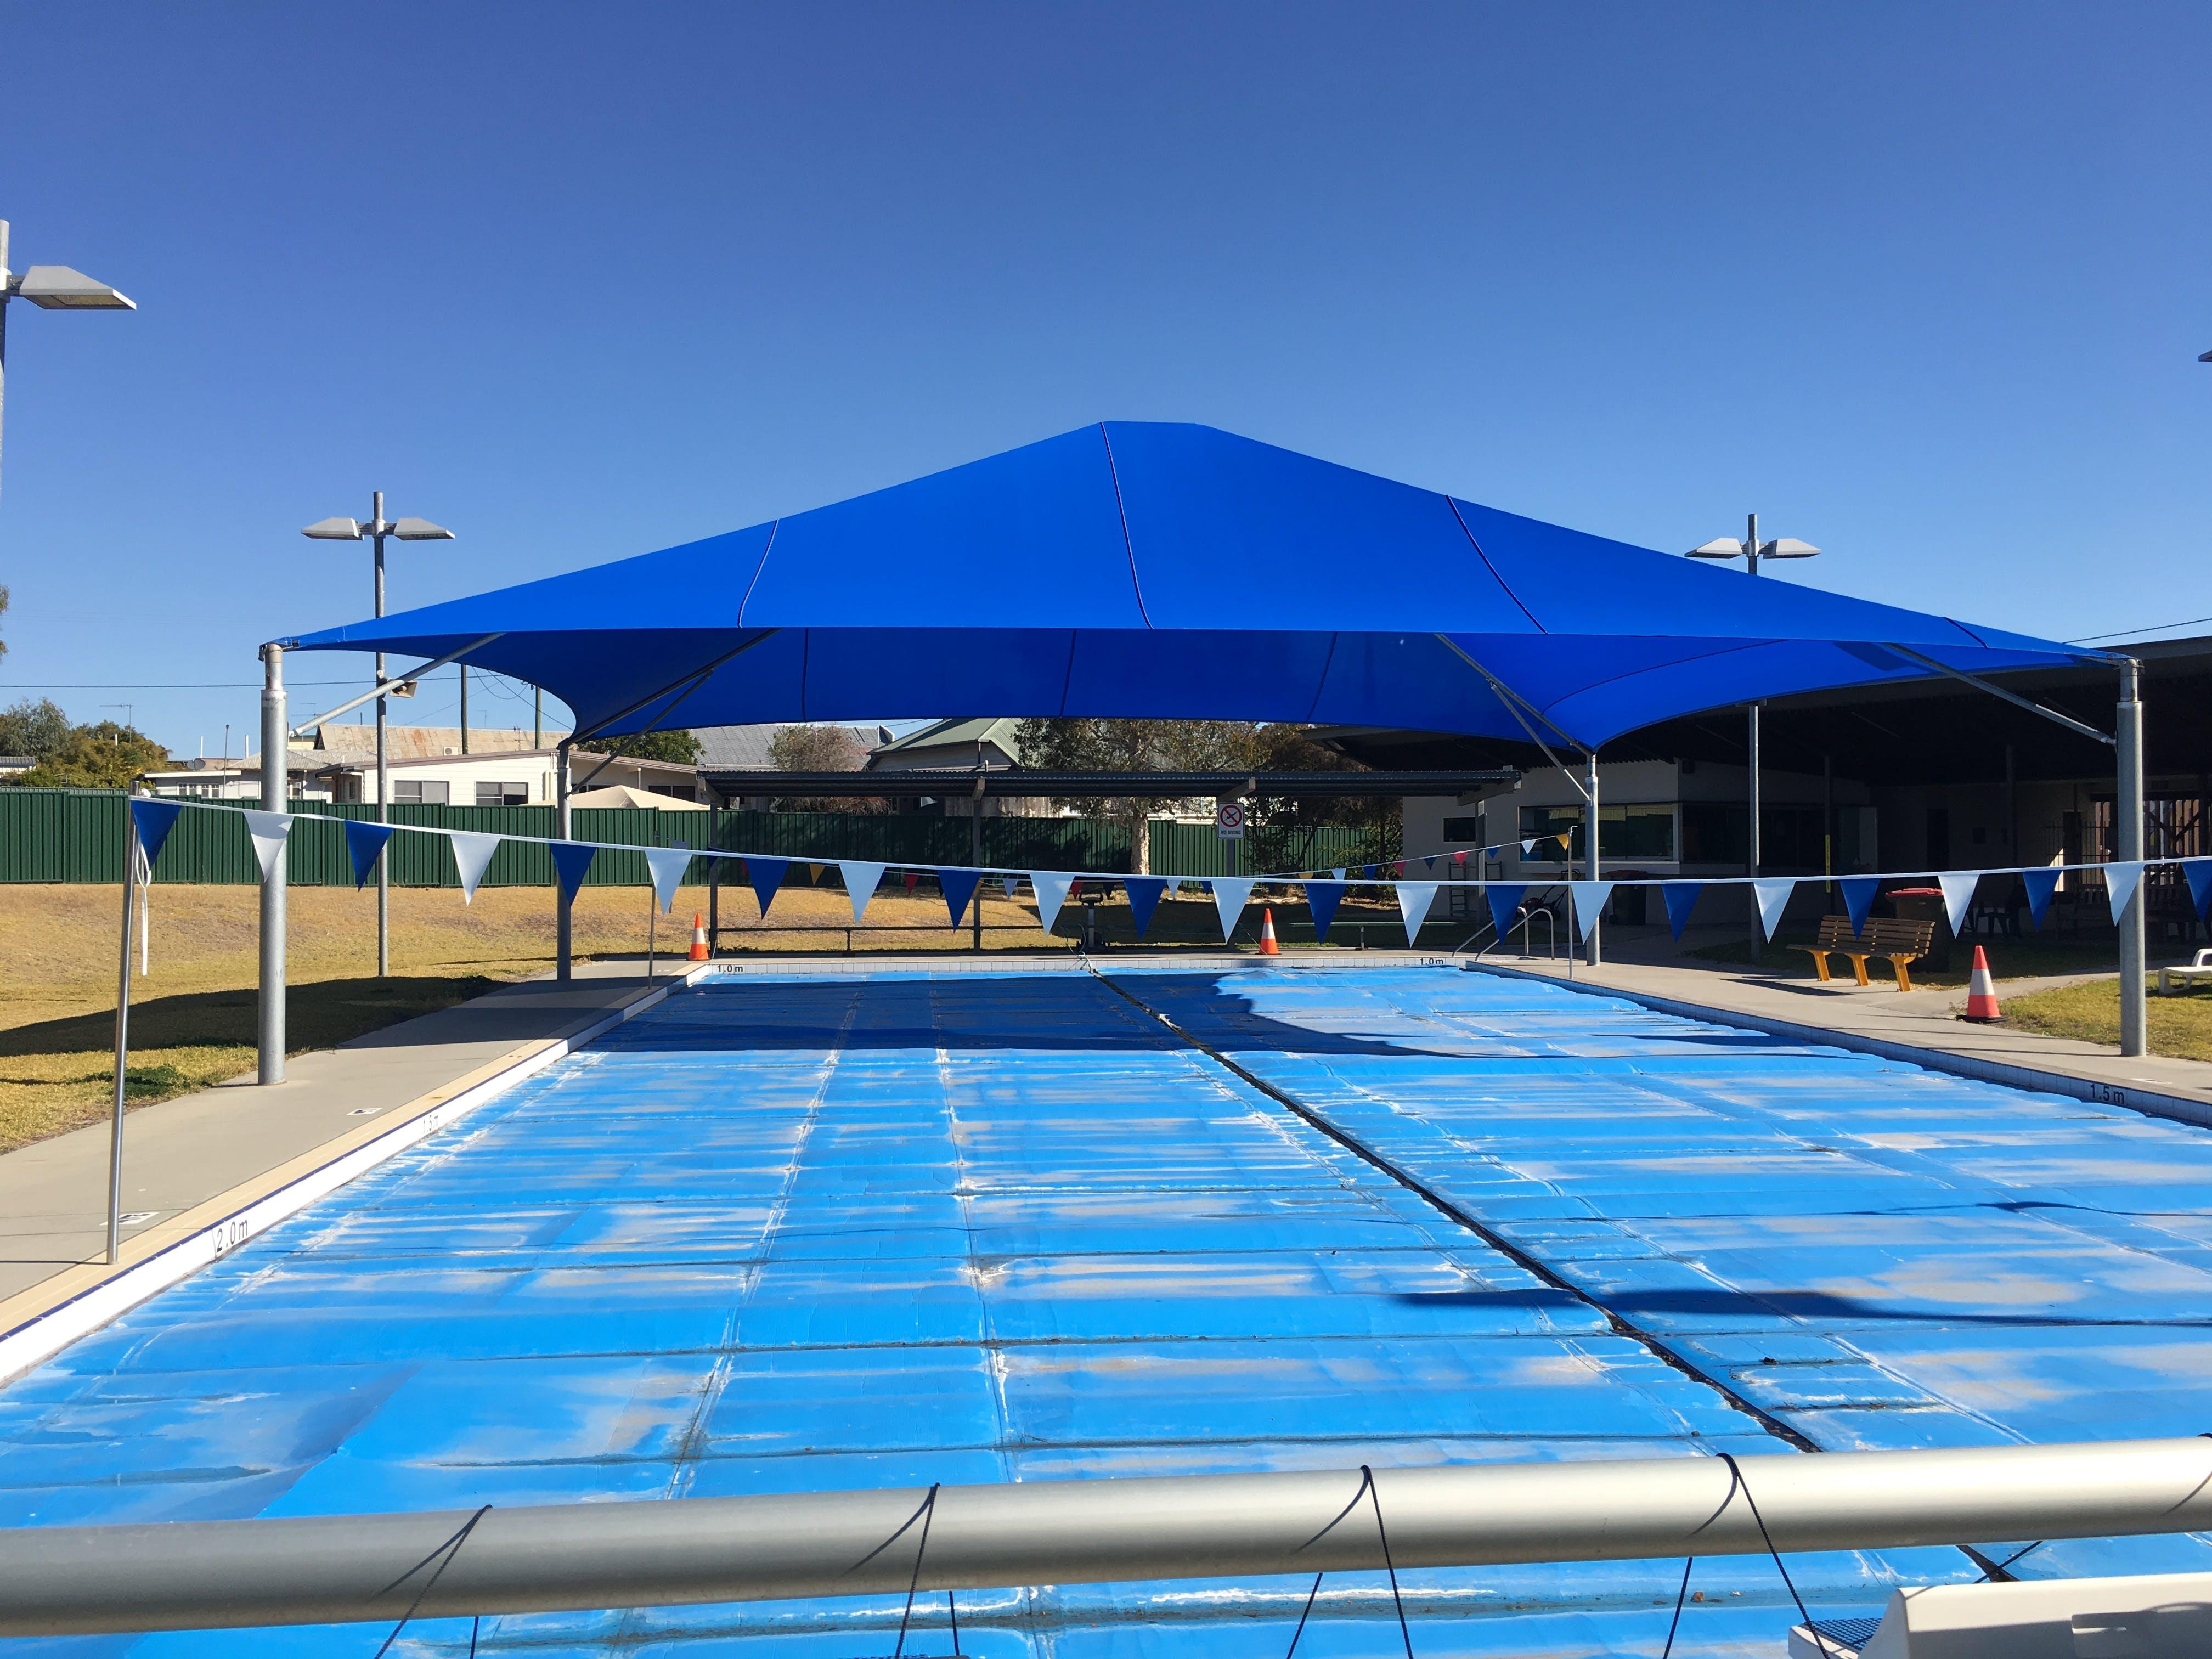 Springsure Aquatic Centre